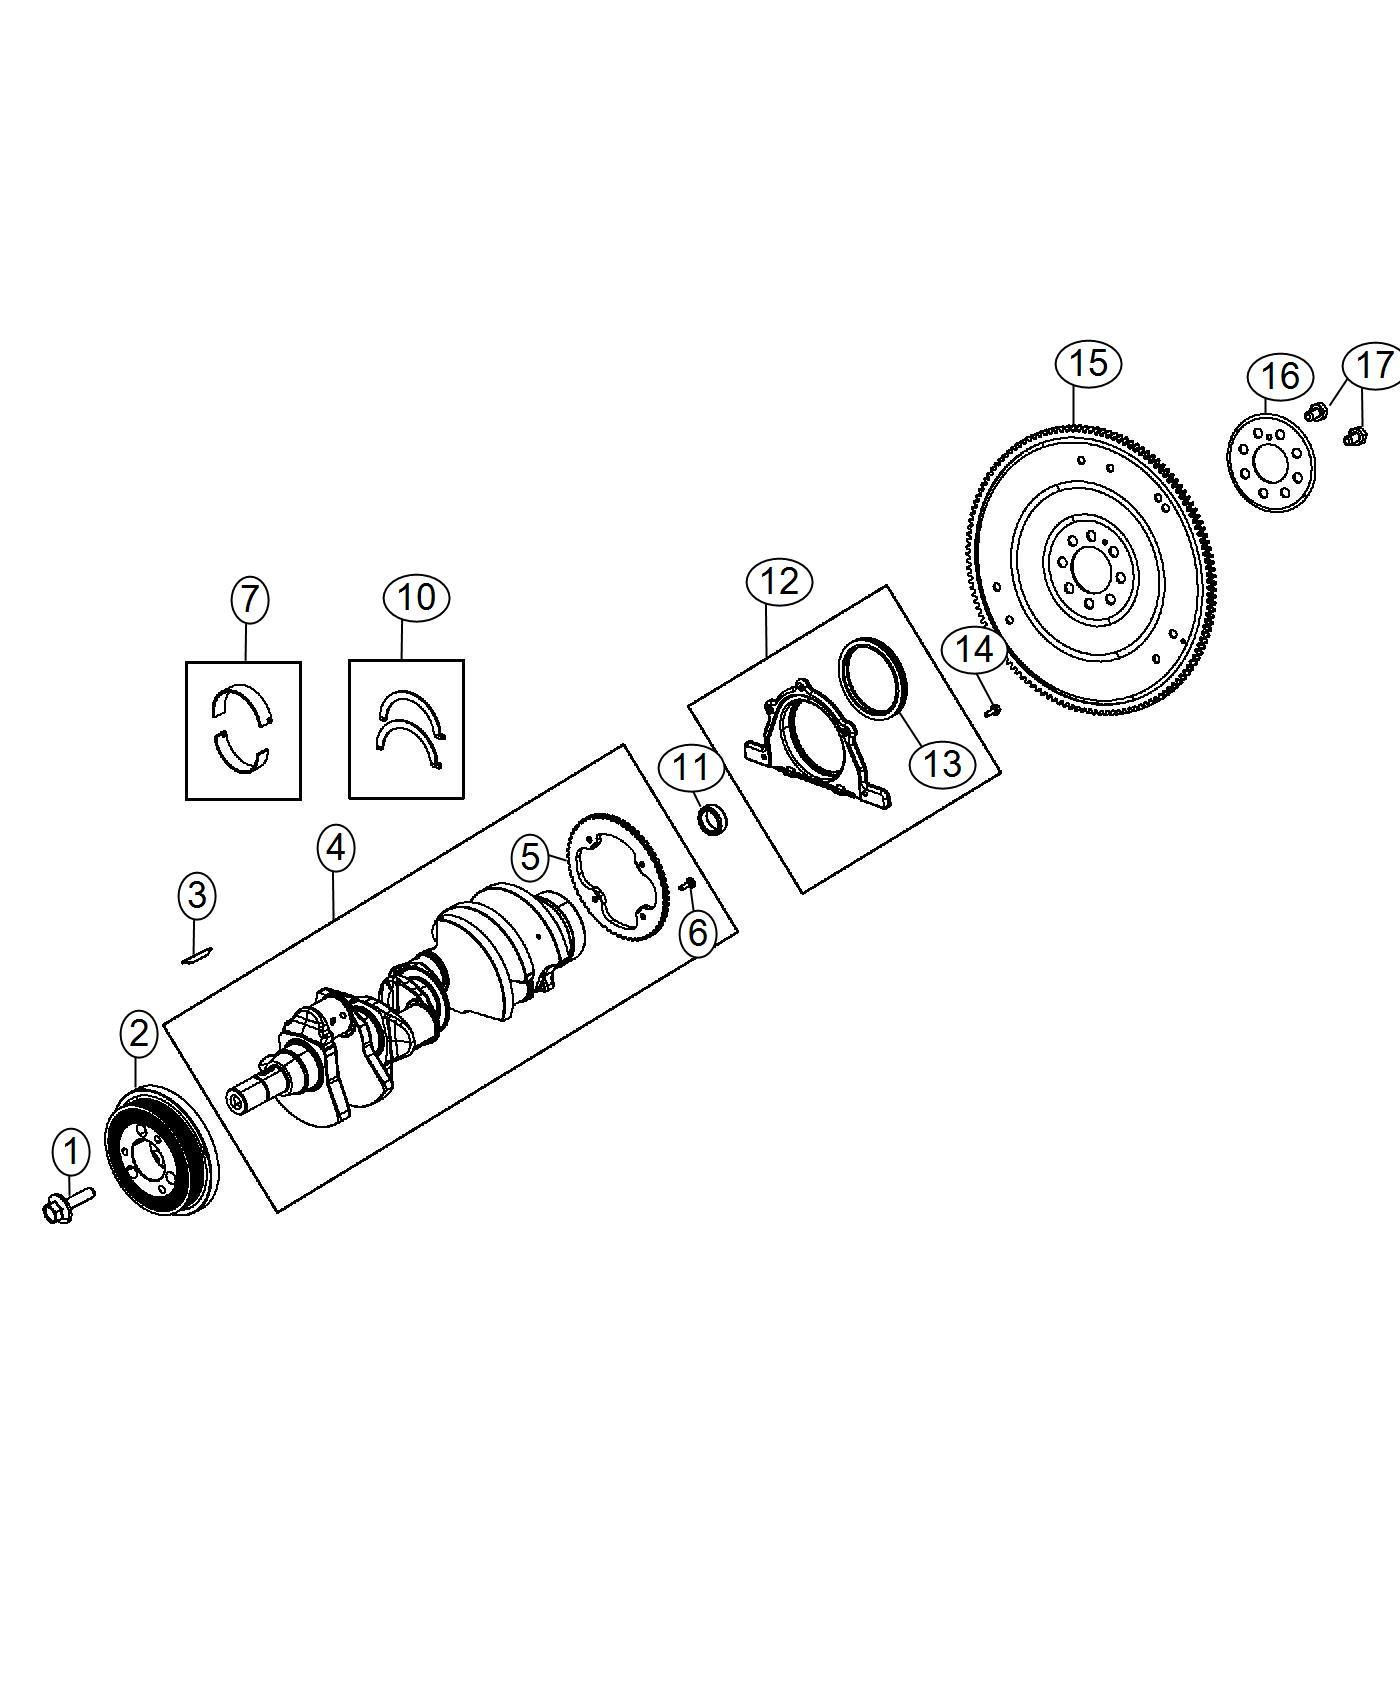 Ram Plate Torque Converter Drive 6 Spd Auto Aisin